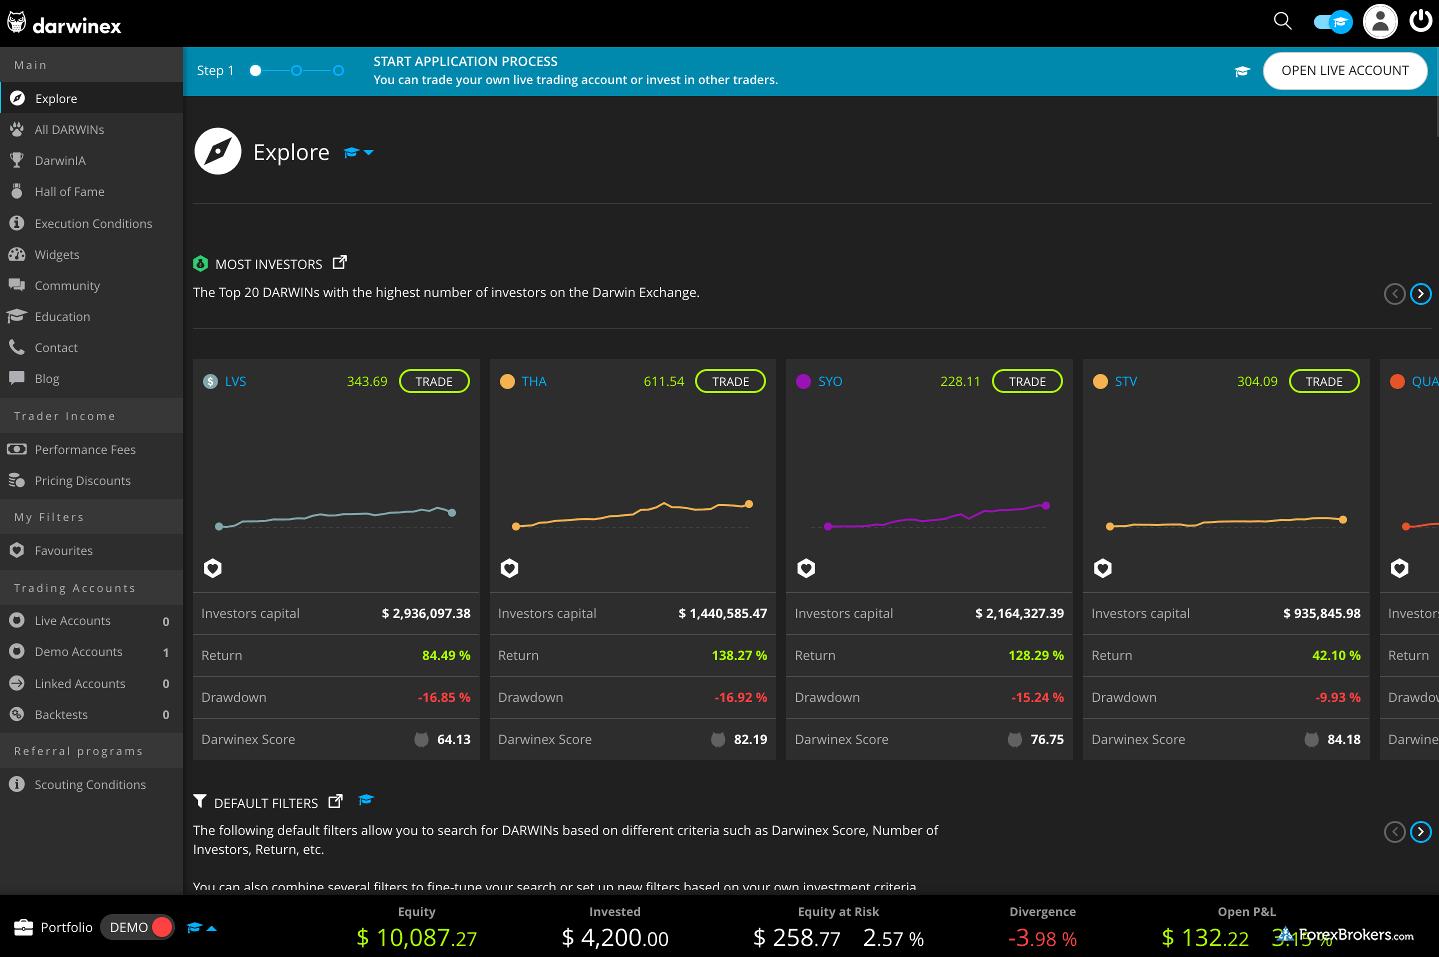 Darwinex web platform dashboard